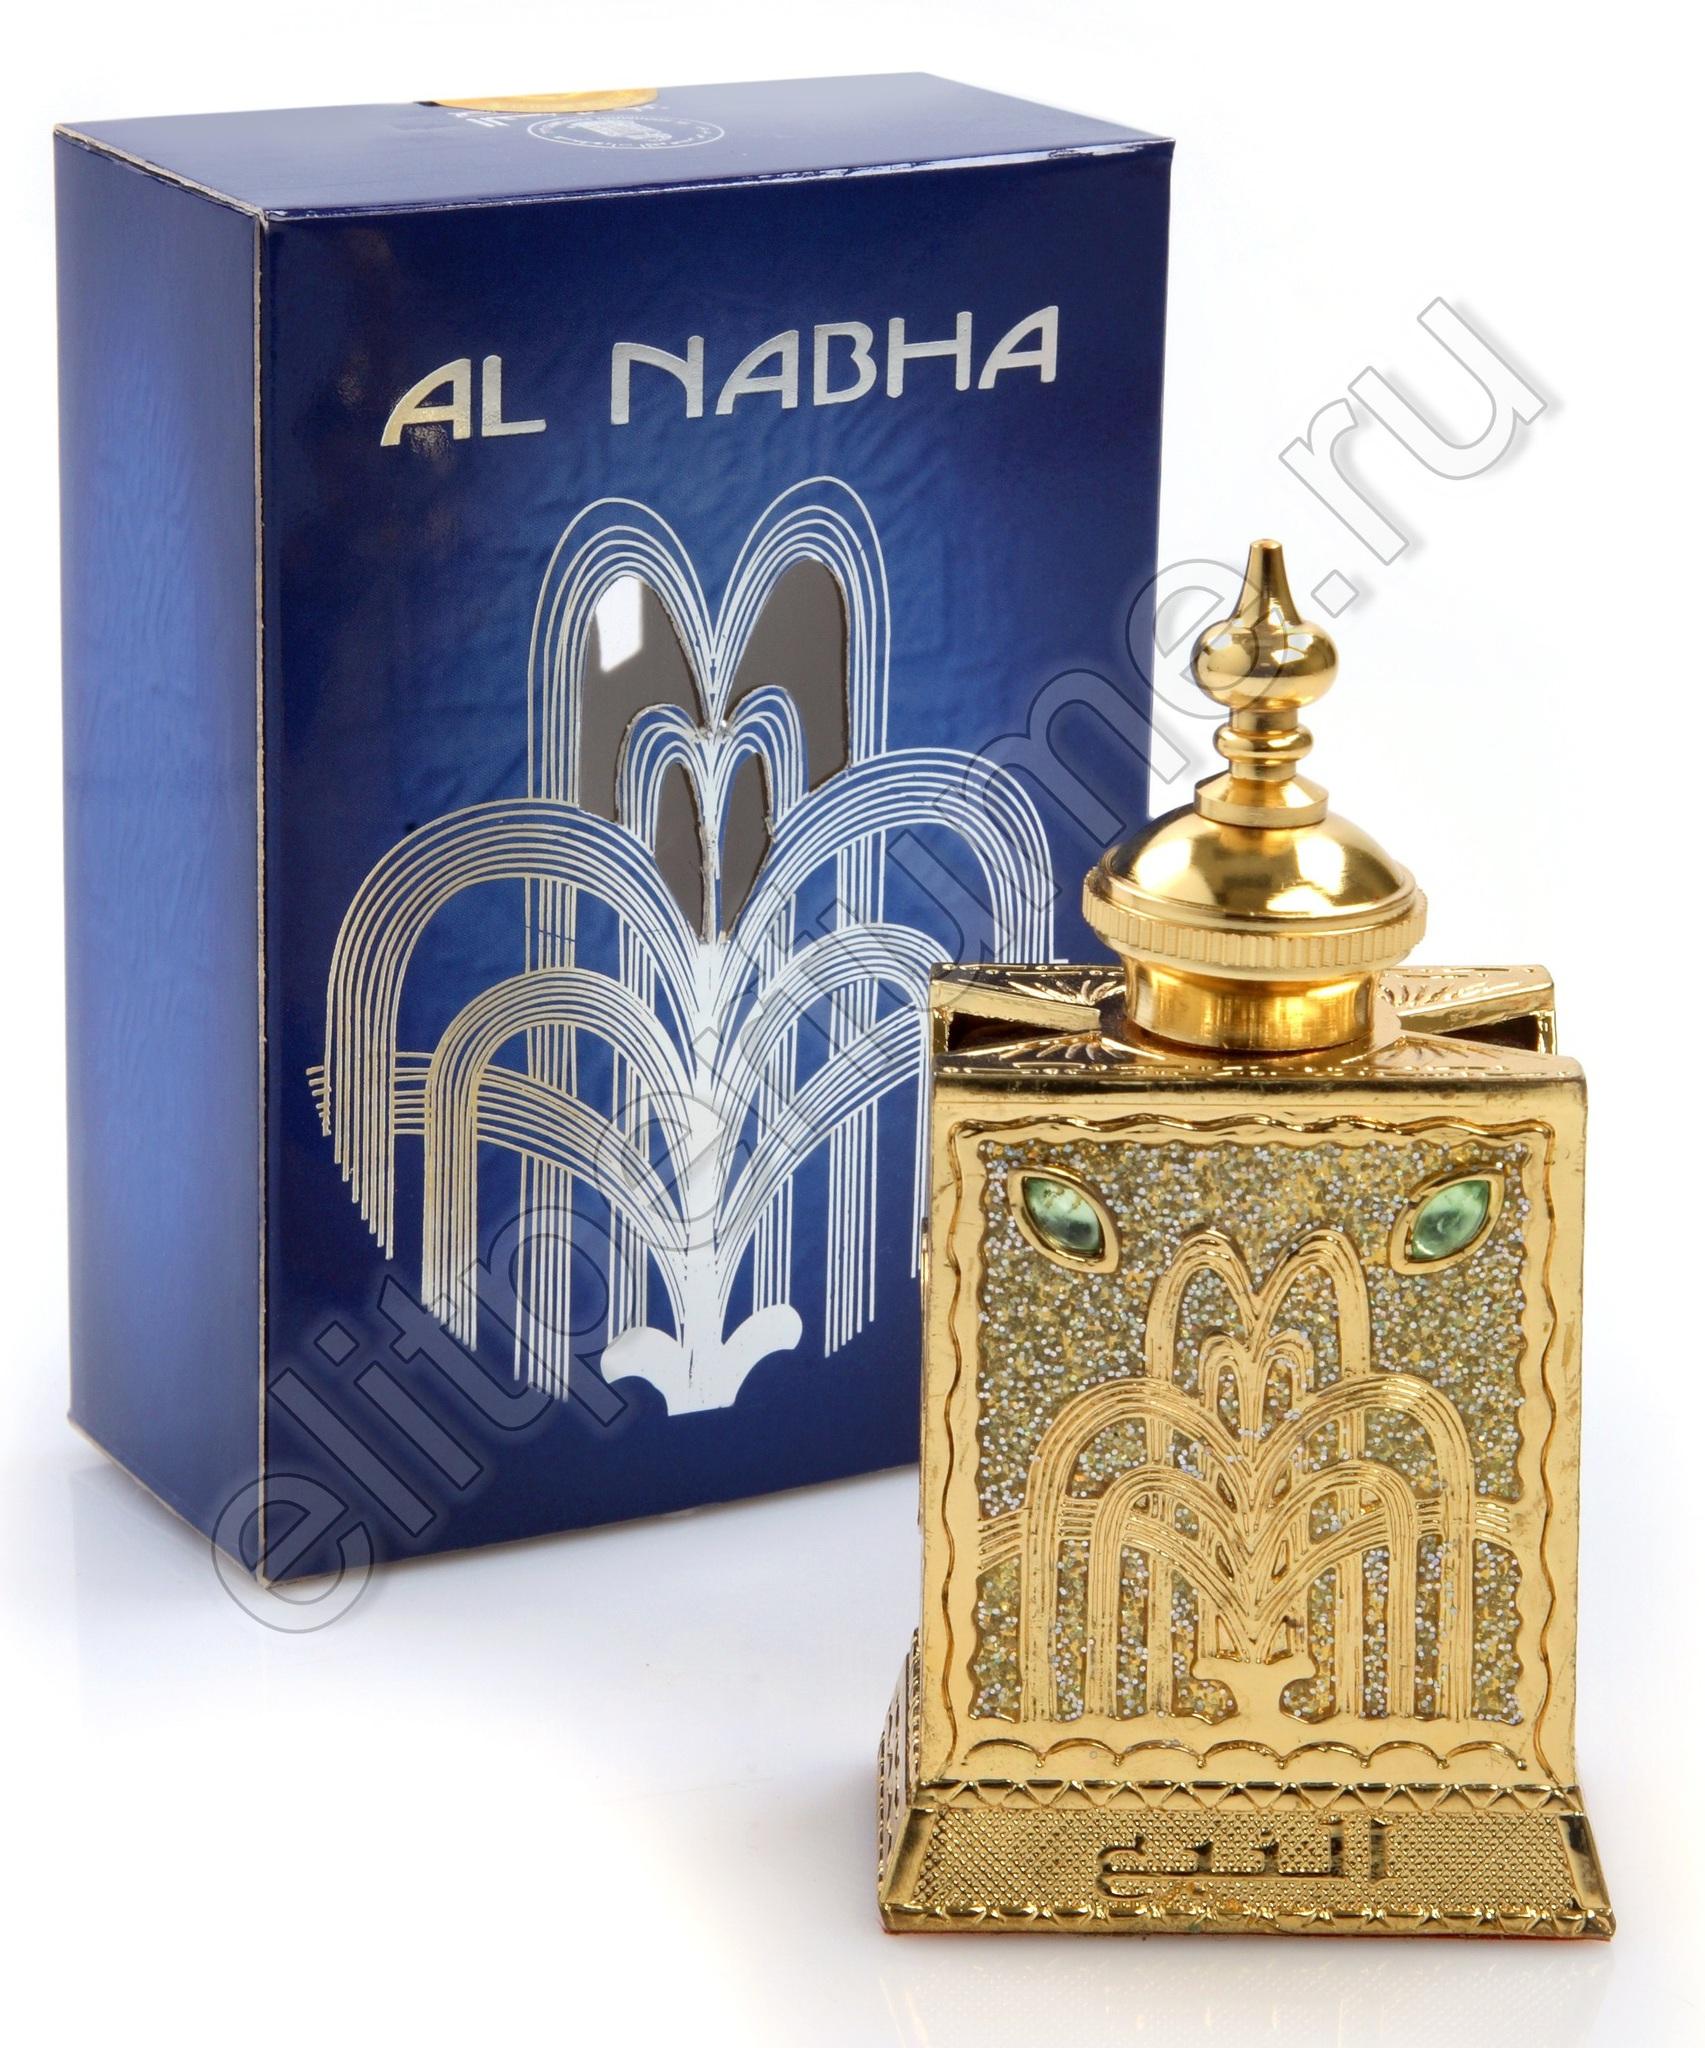 Аль-Наба Al Nabha 40 мл арабские масляные духи от Аль Харамайн Al Haramain Perfumes